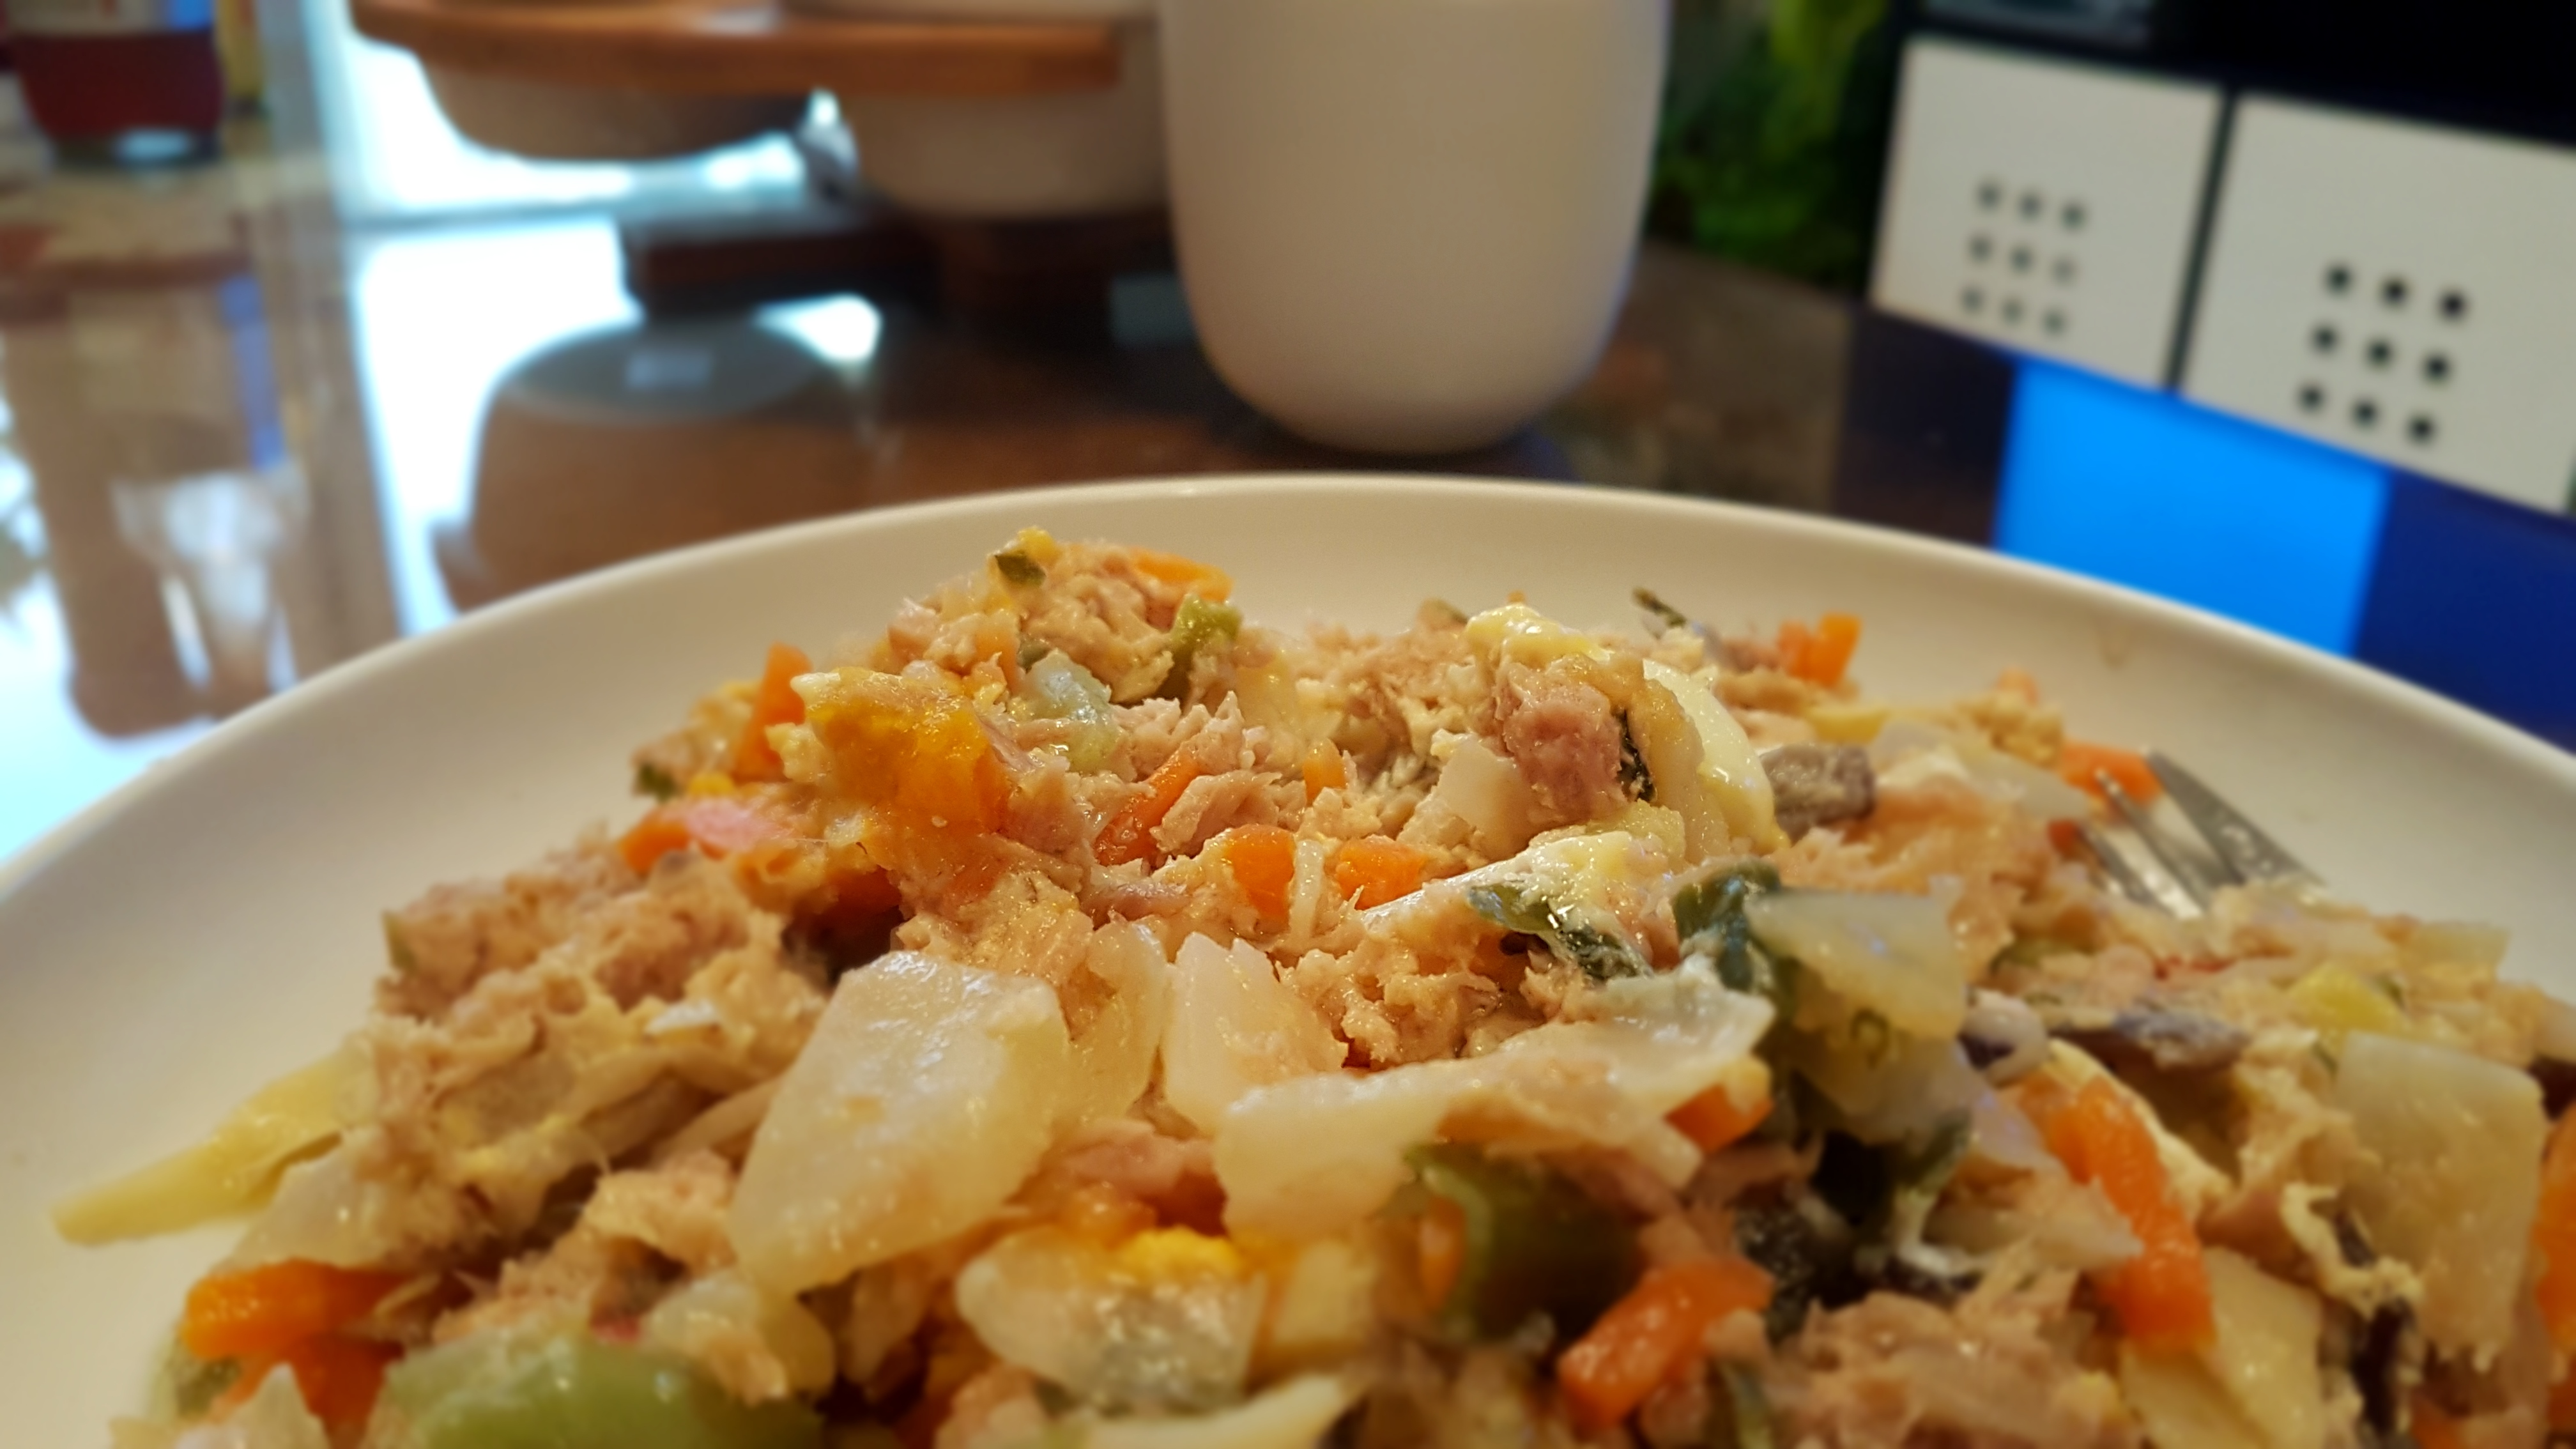 Oriental Mix Omelet   املت سبزیجات مخلوط آسیایی